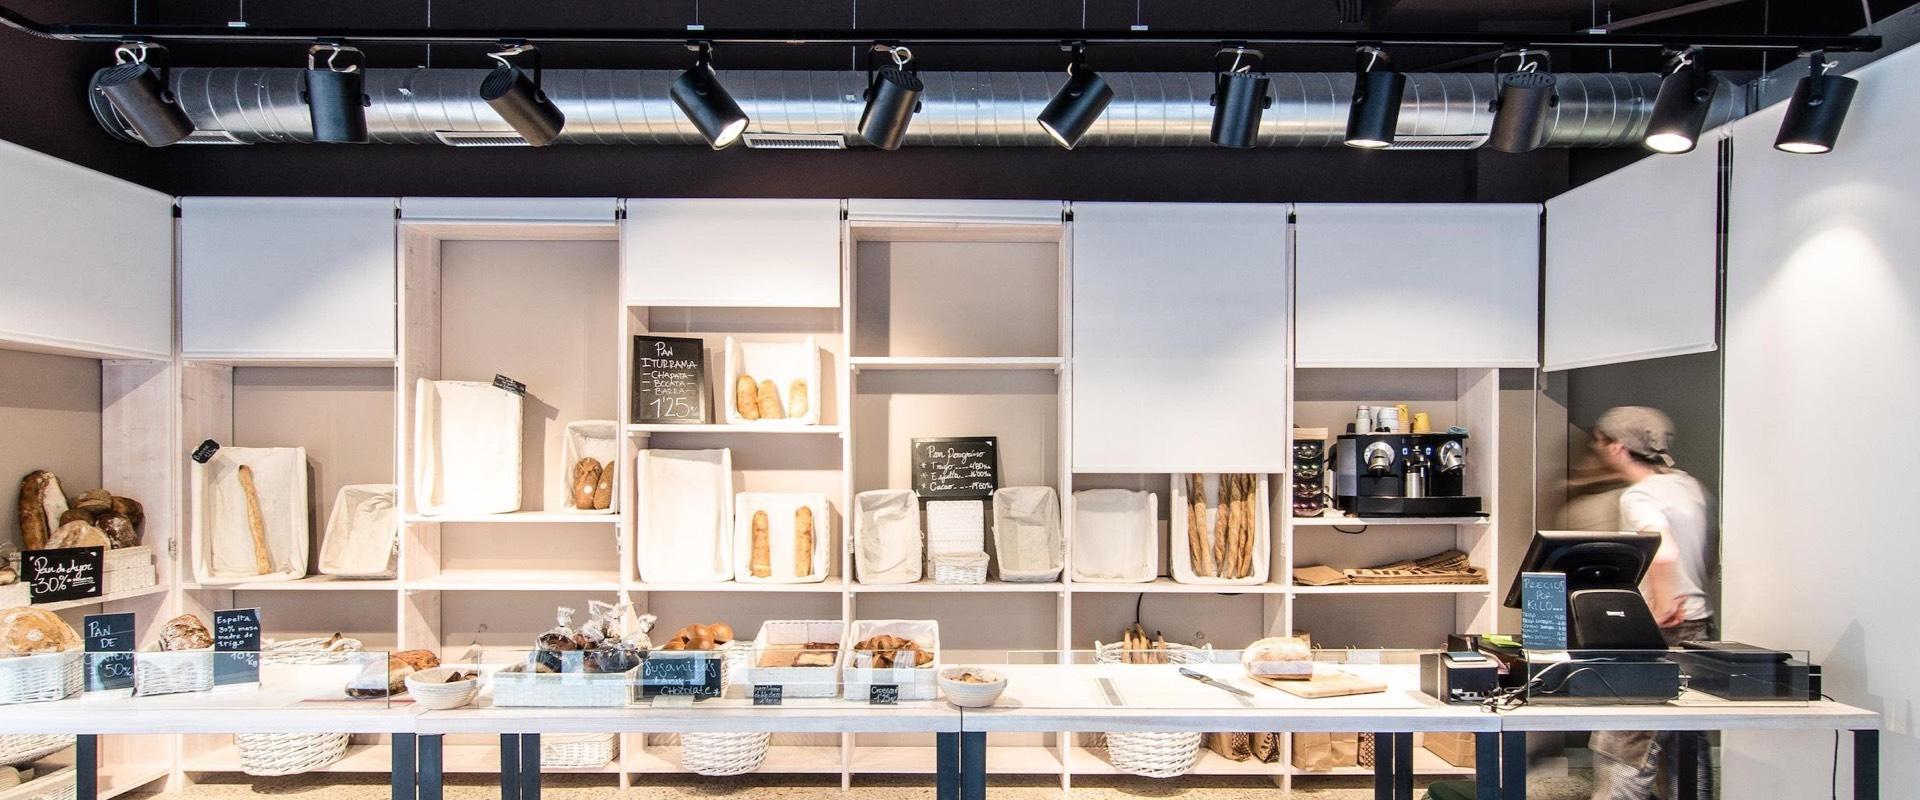 L'Atelier, el hogar del pan.